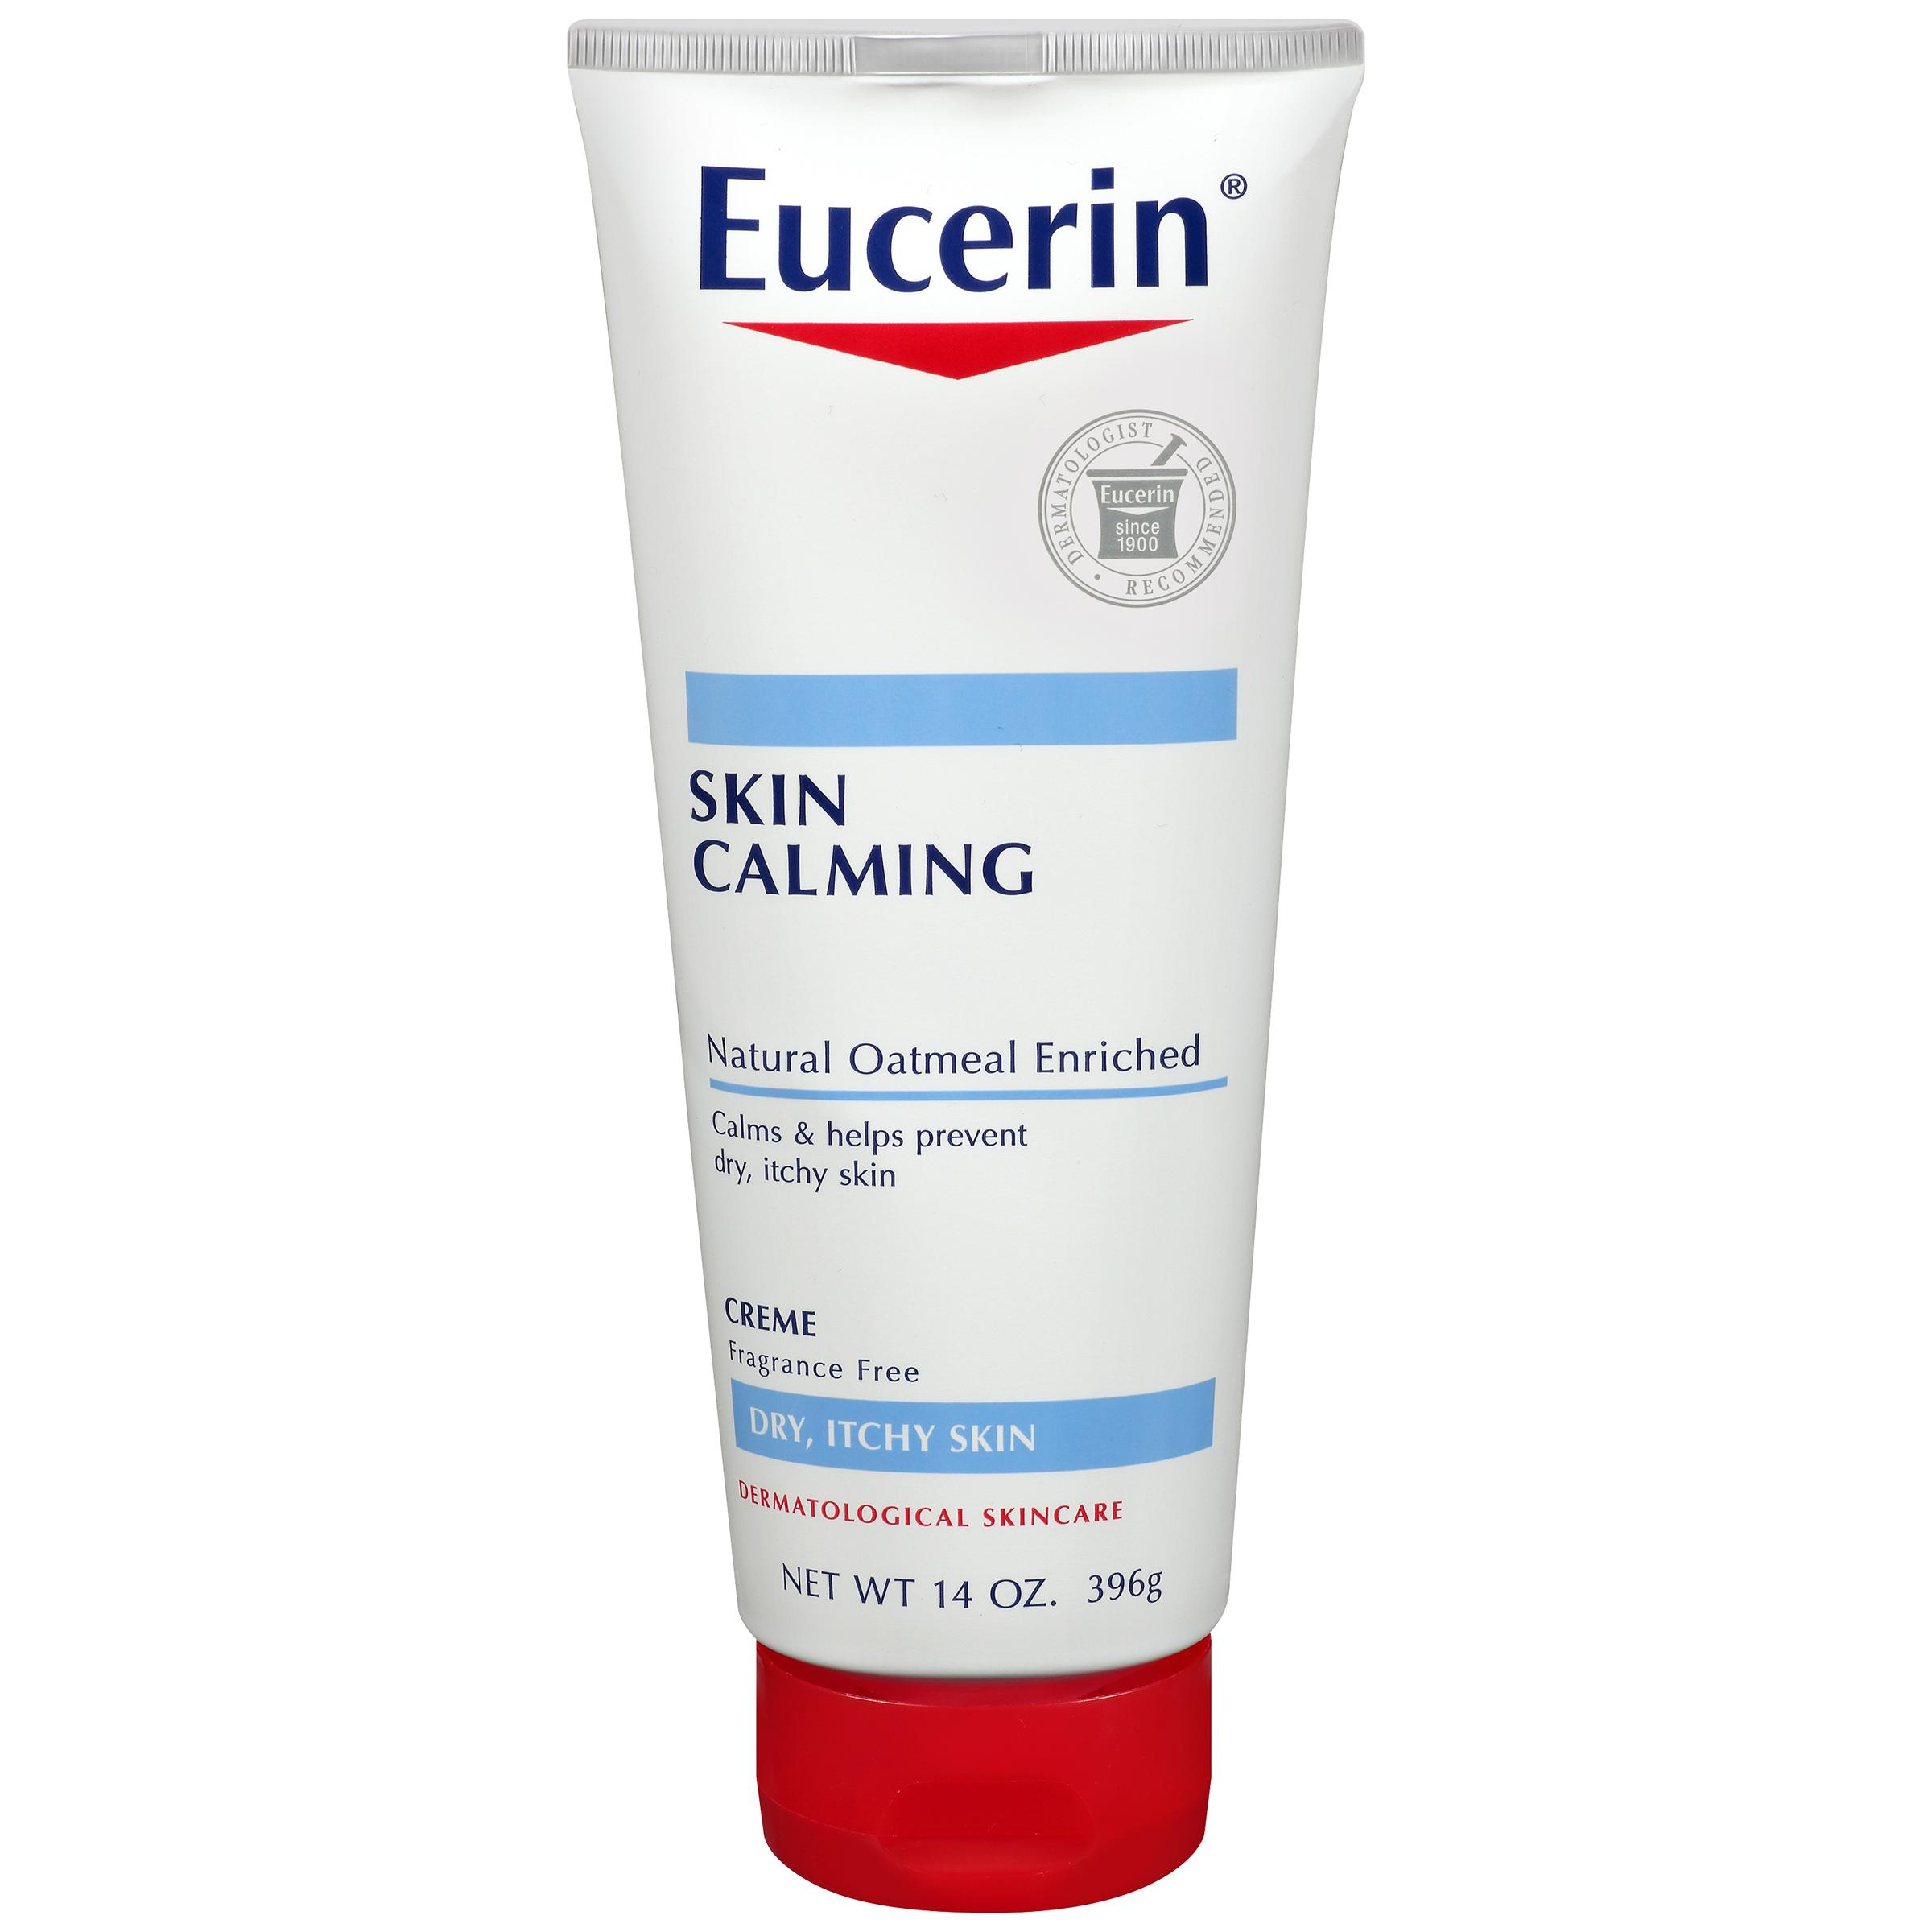 eucerin skin calming daily moisturizing creme 14 ounce beauty. Black Bedroom Furniture Sets. Home Design Ideas